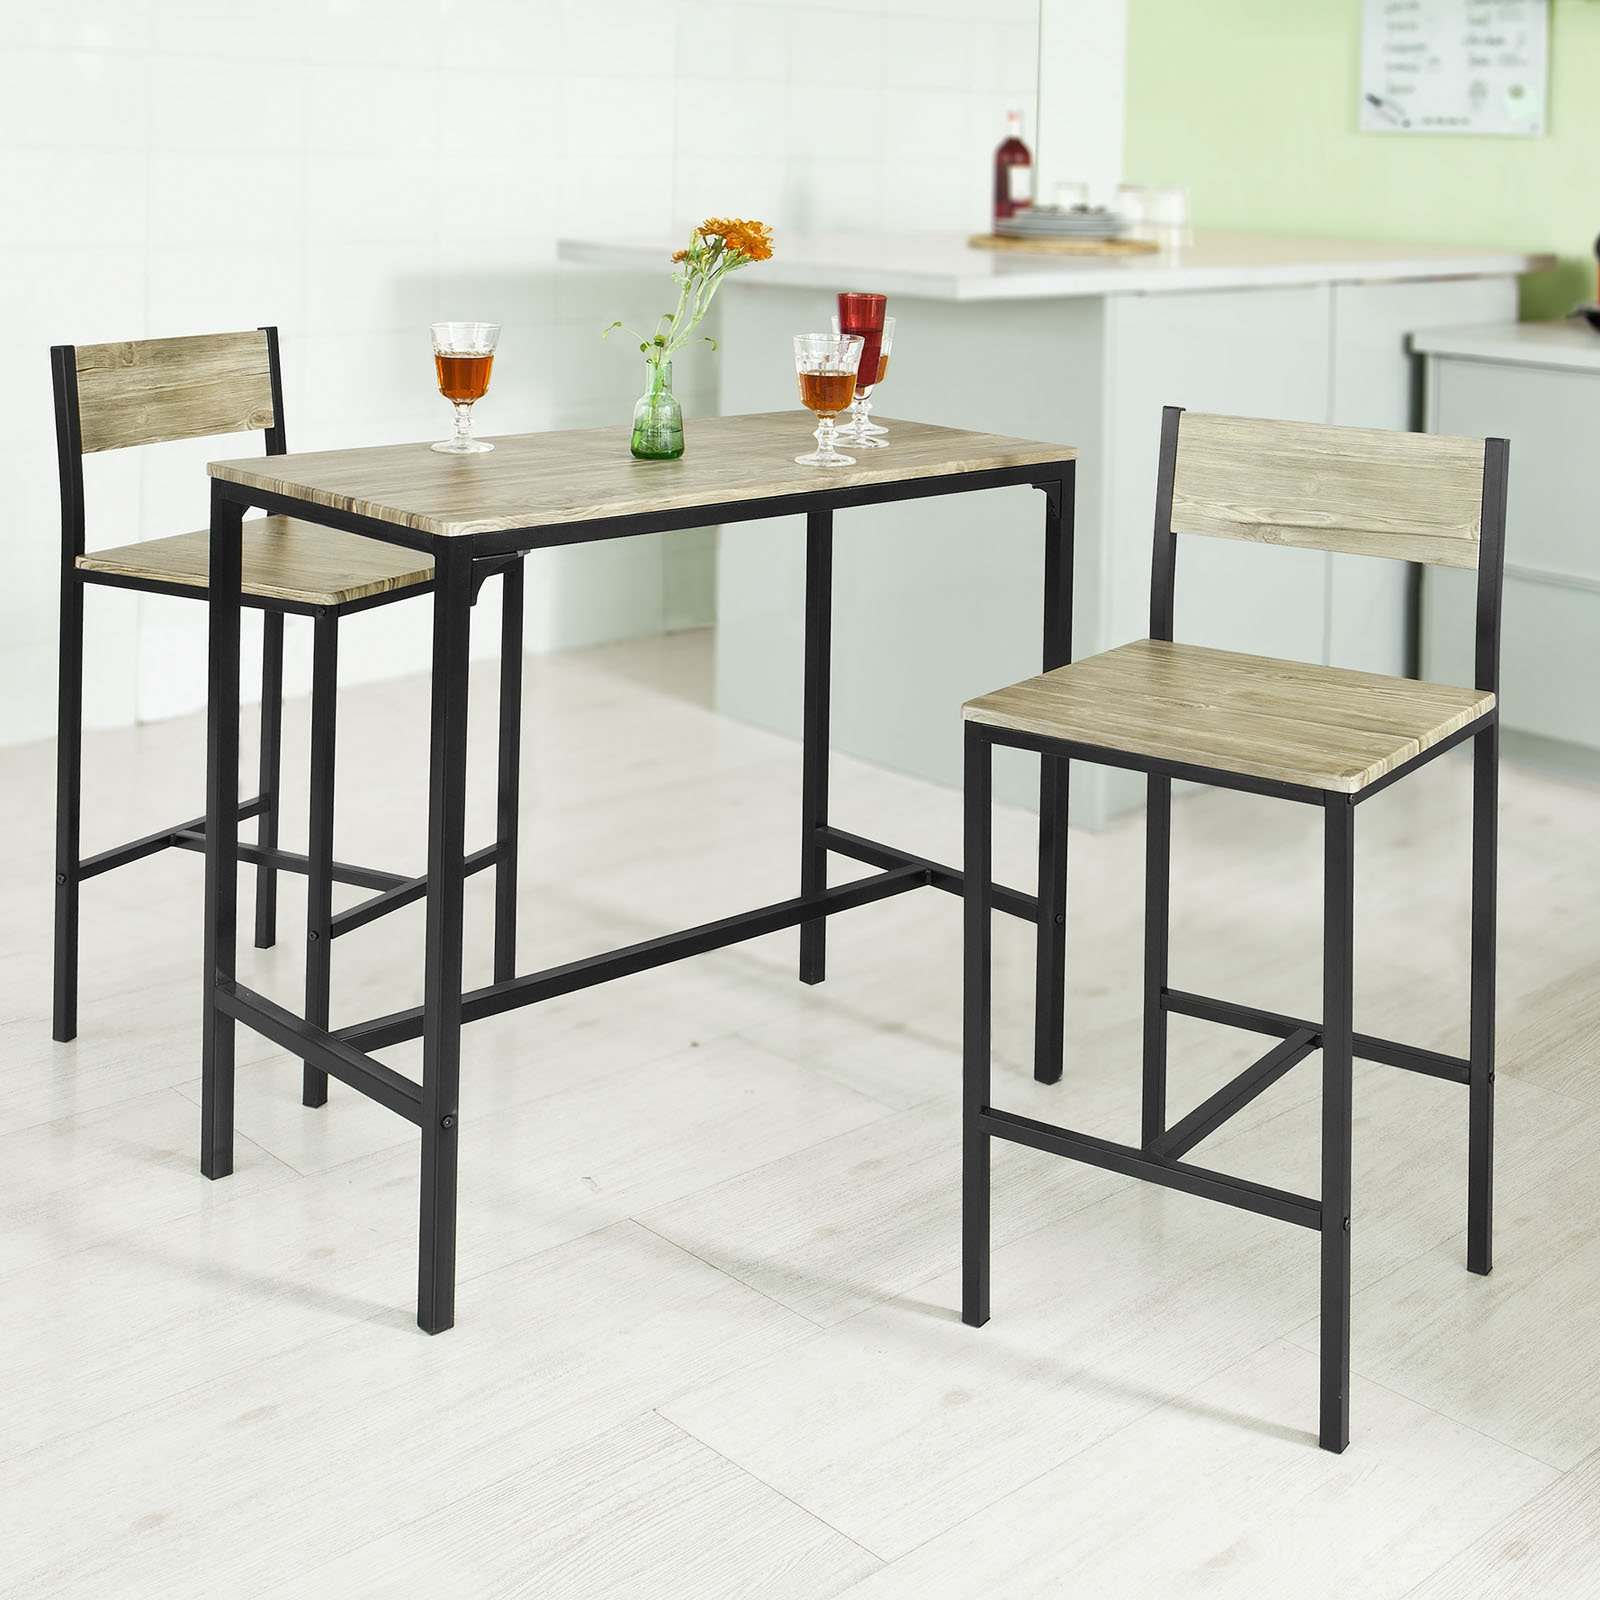 Haotian OGT03 Sling High Bistro Set,Home Kitchen Outdoor Garden Bar Set,Patio Furniture, Dining Set